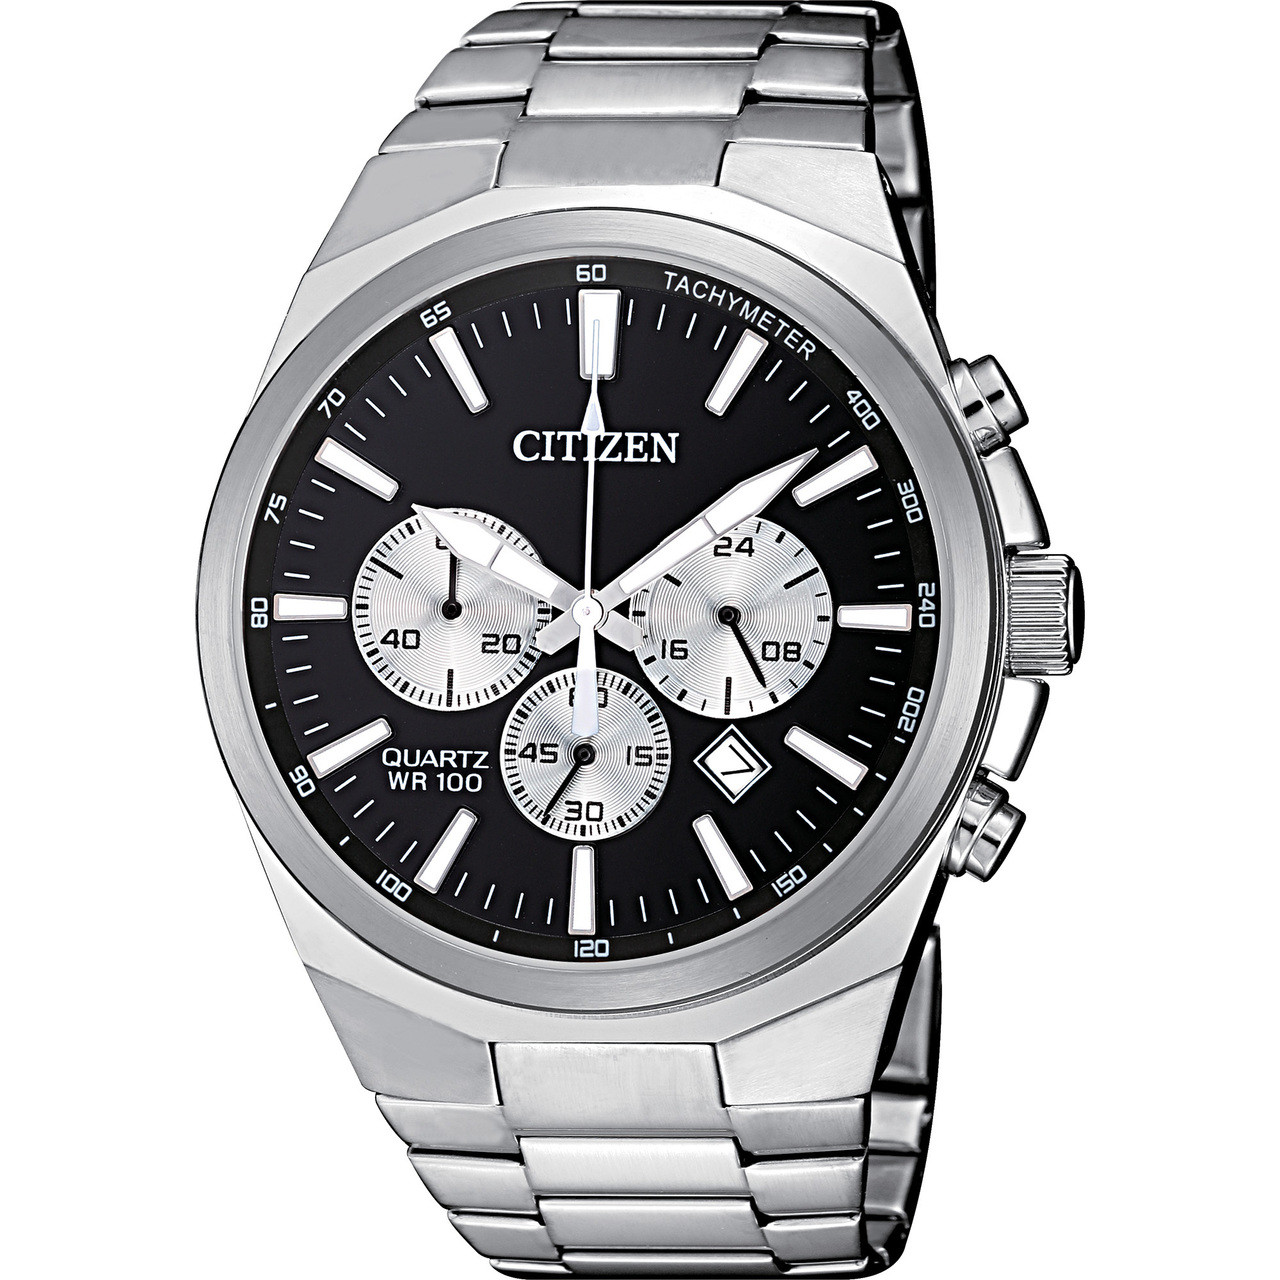 Citizen Quartz Men S Chronograph Black Dial Watch An8170 59e